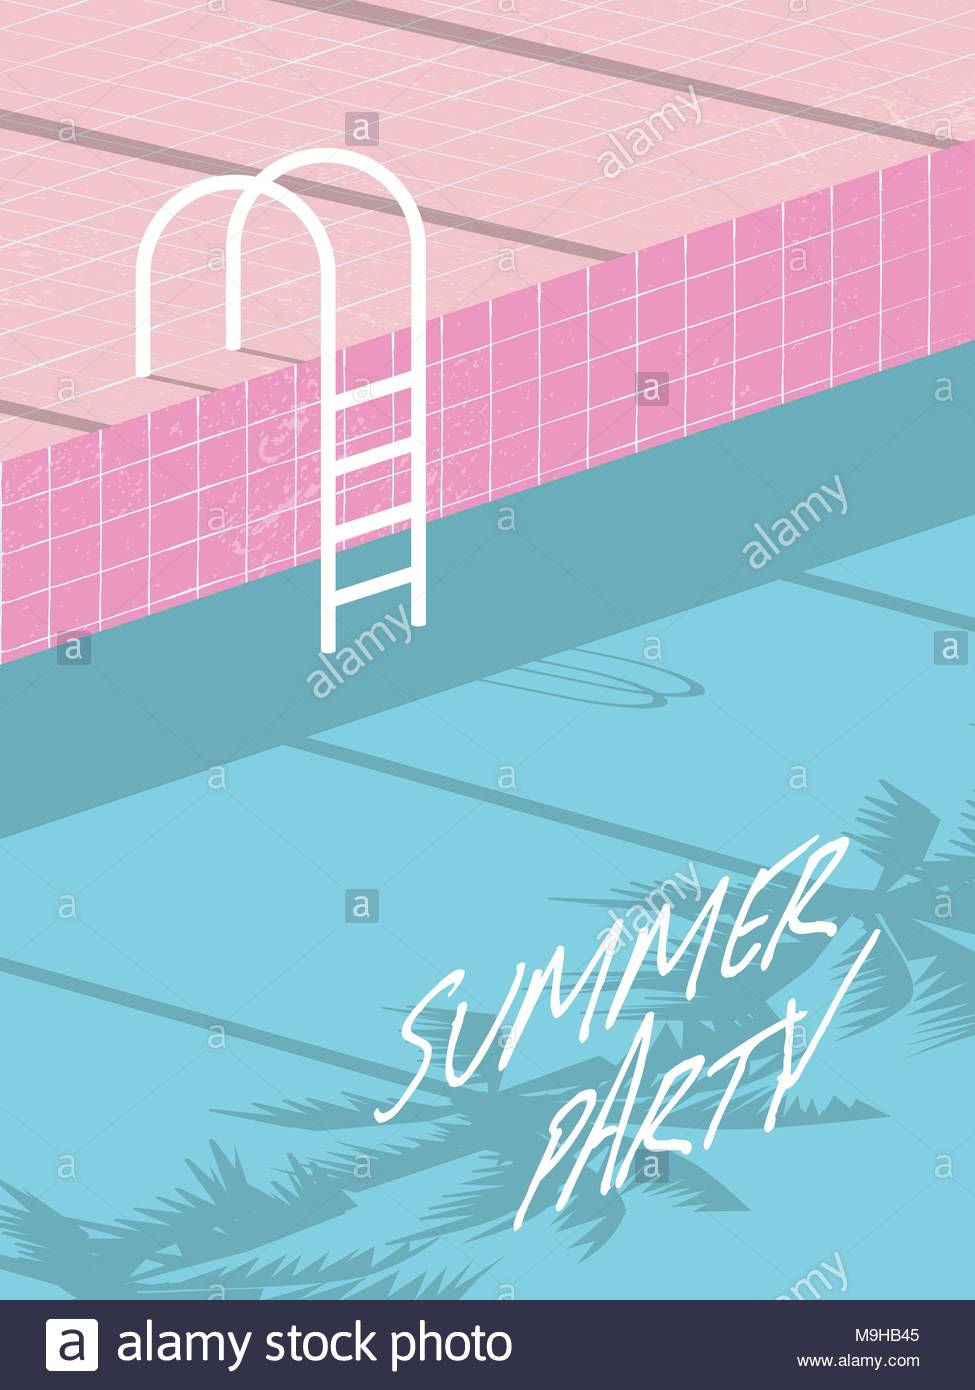 Summer Pool Party Invitation Flyer Affiche Banniere Modele Retro